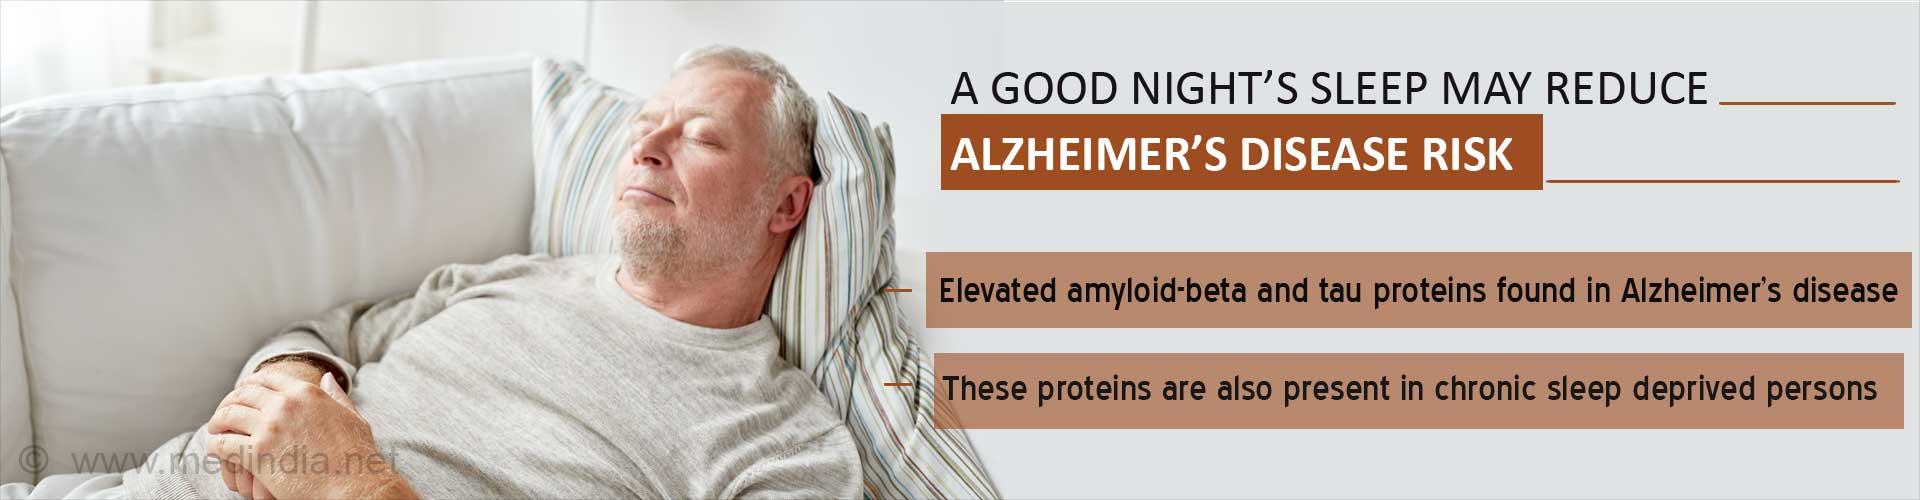 Chronic Poor Sleep Linked to Increased Risk of Alzheimer's Disease